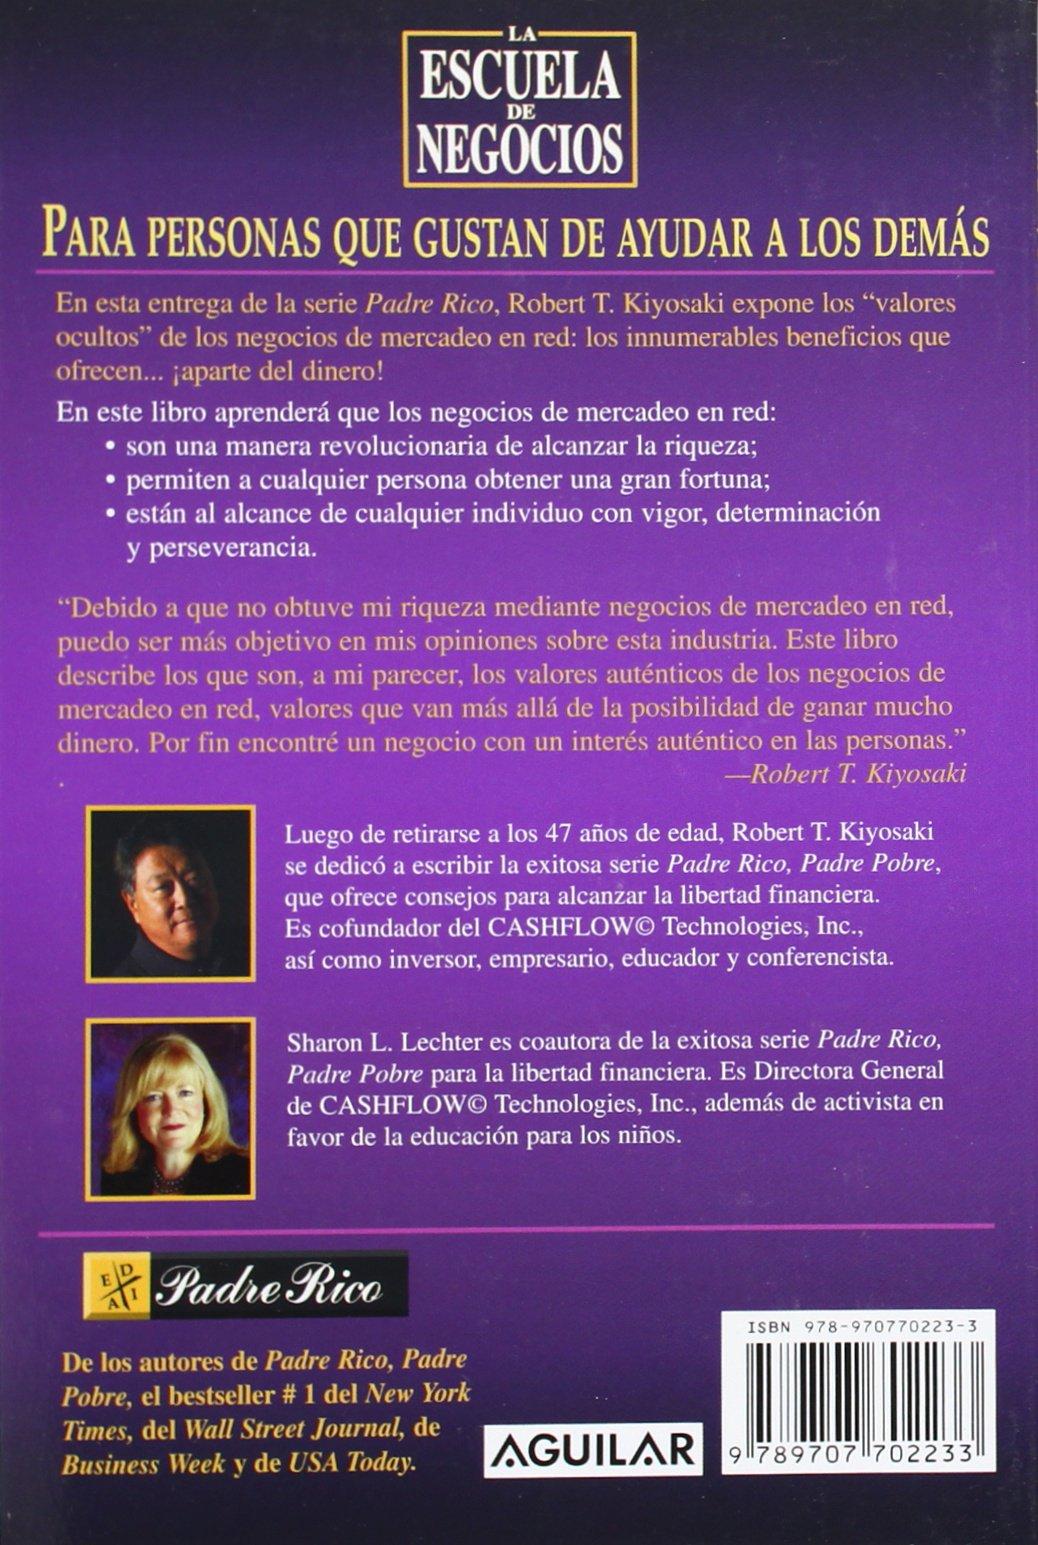 ESCUELA DE NEGOCIOS ROBERT T. KIYOSAKI - Libros De Millonarios